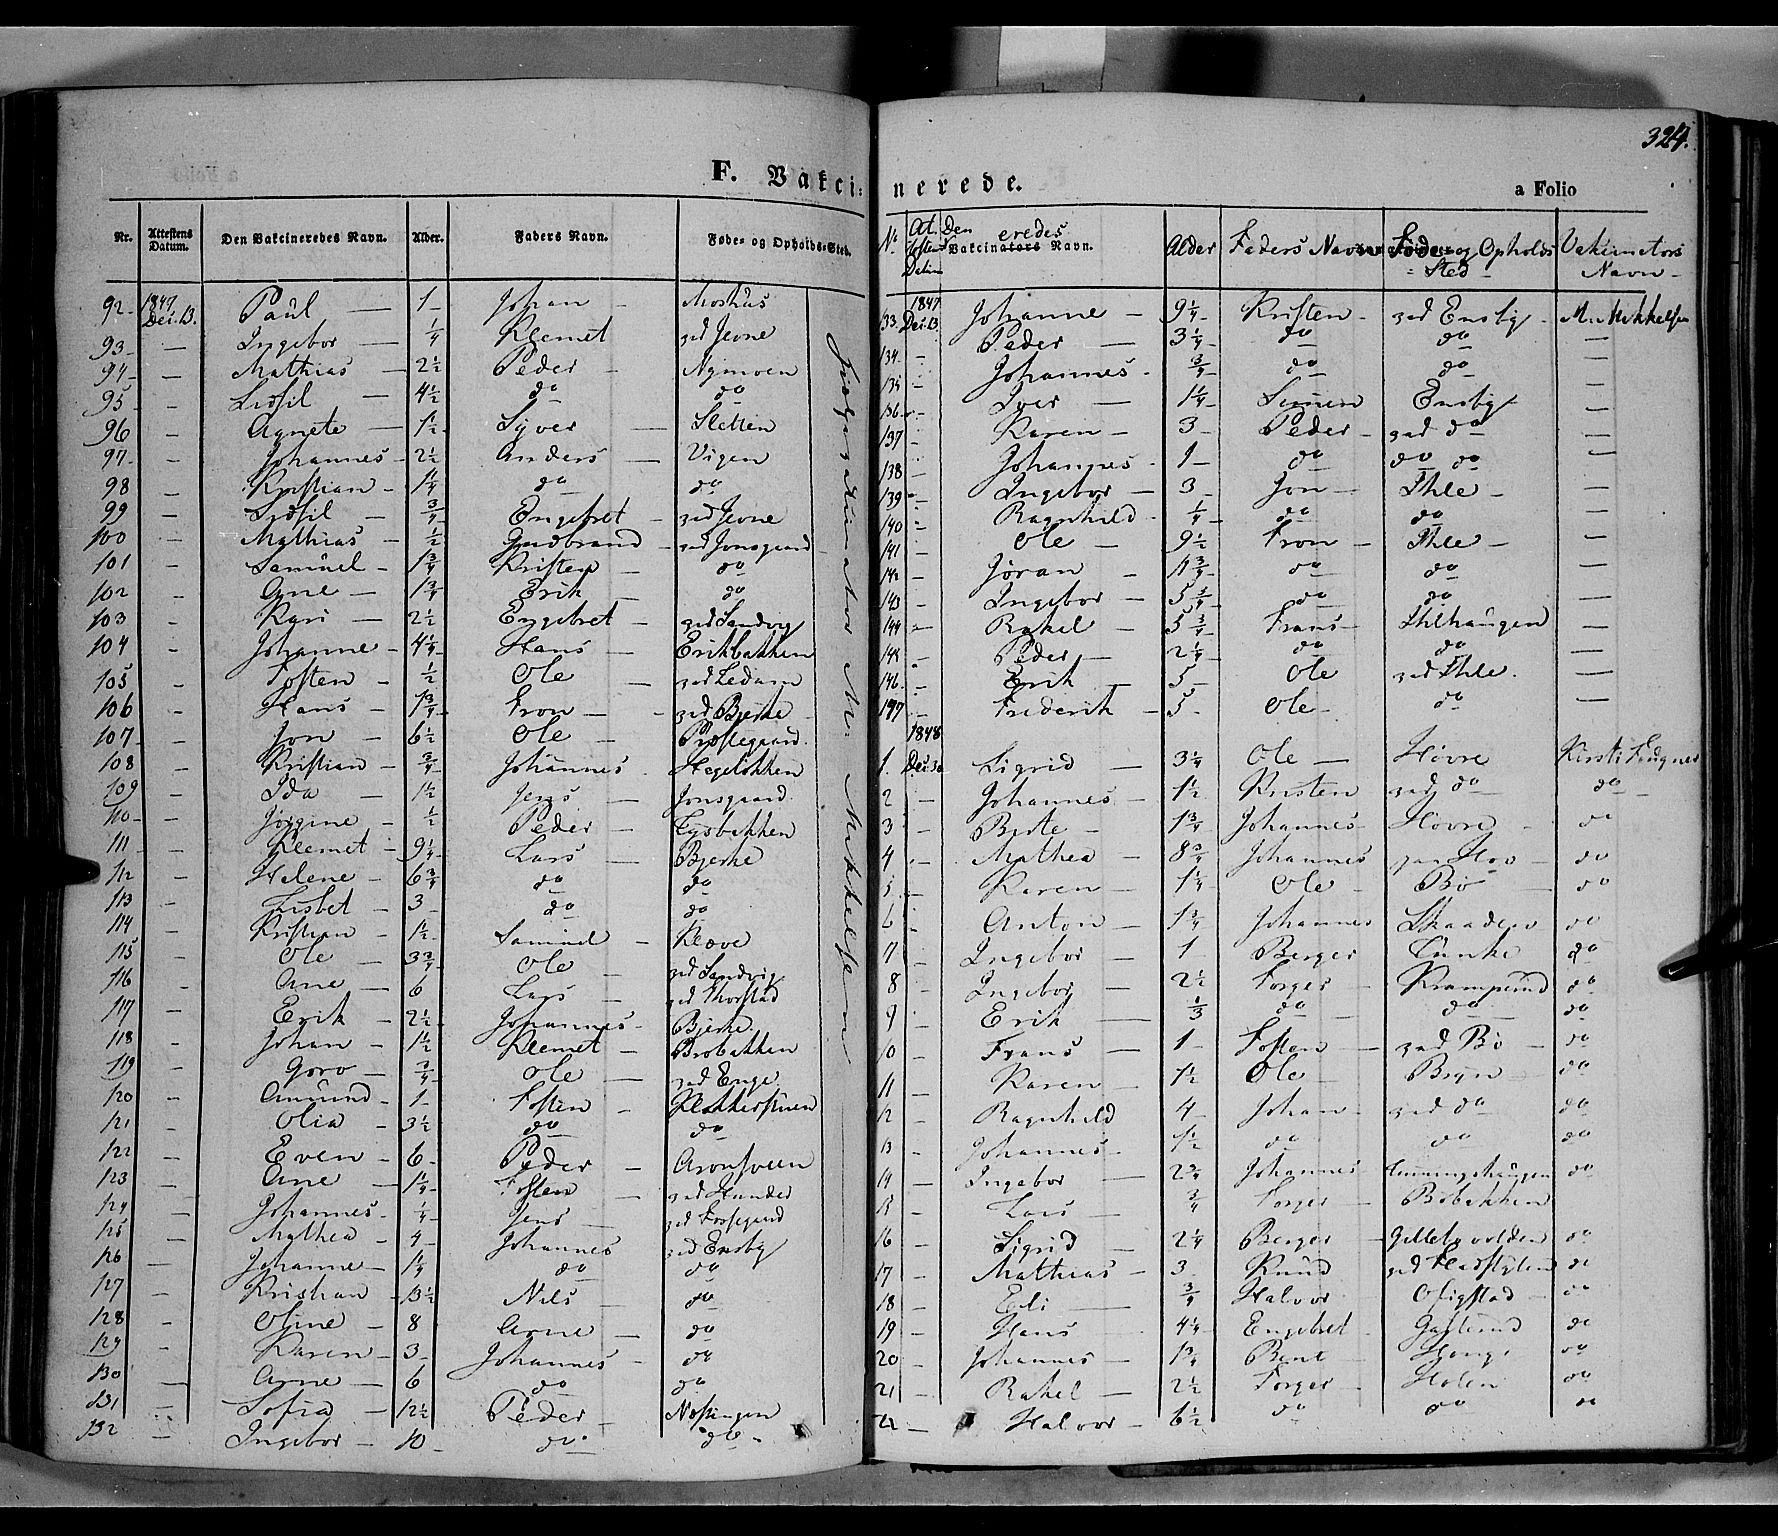 SAH, Øyer prestekontor, Ministerialbok nr. 5, 1842-1857, s. 324